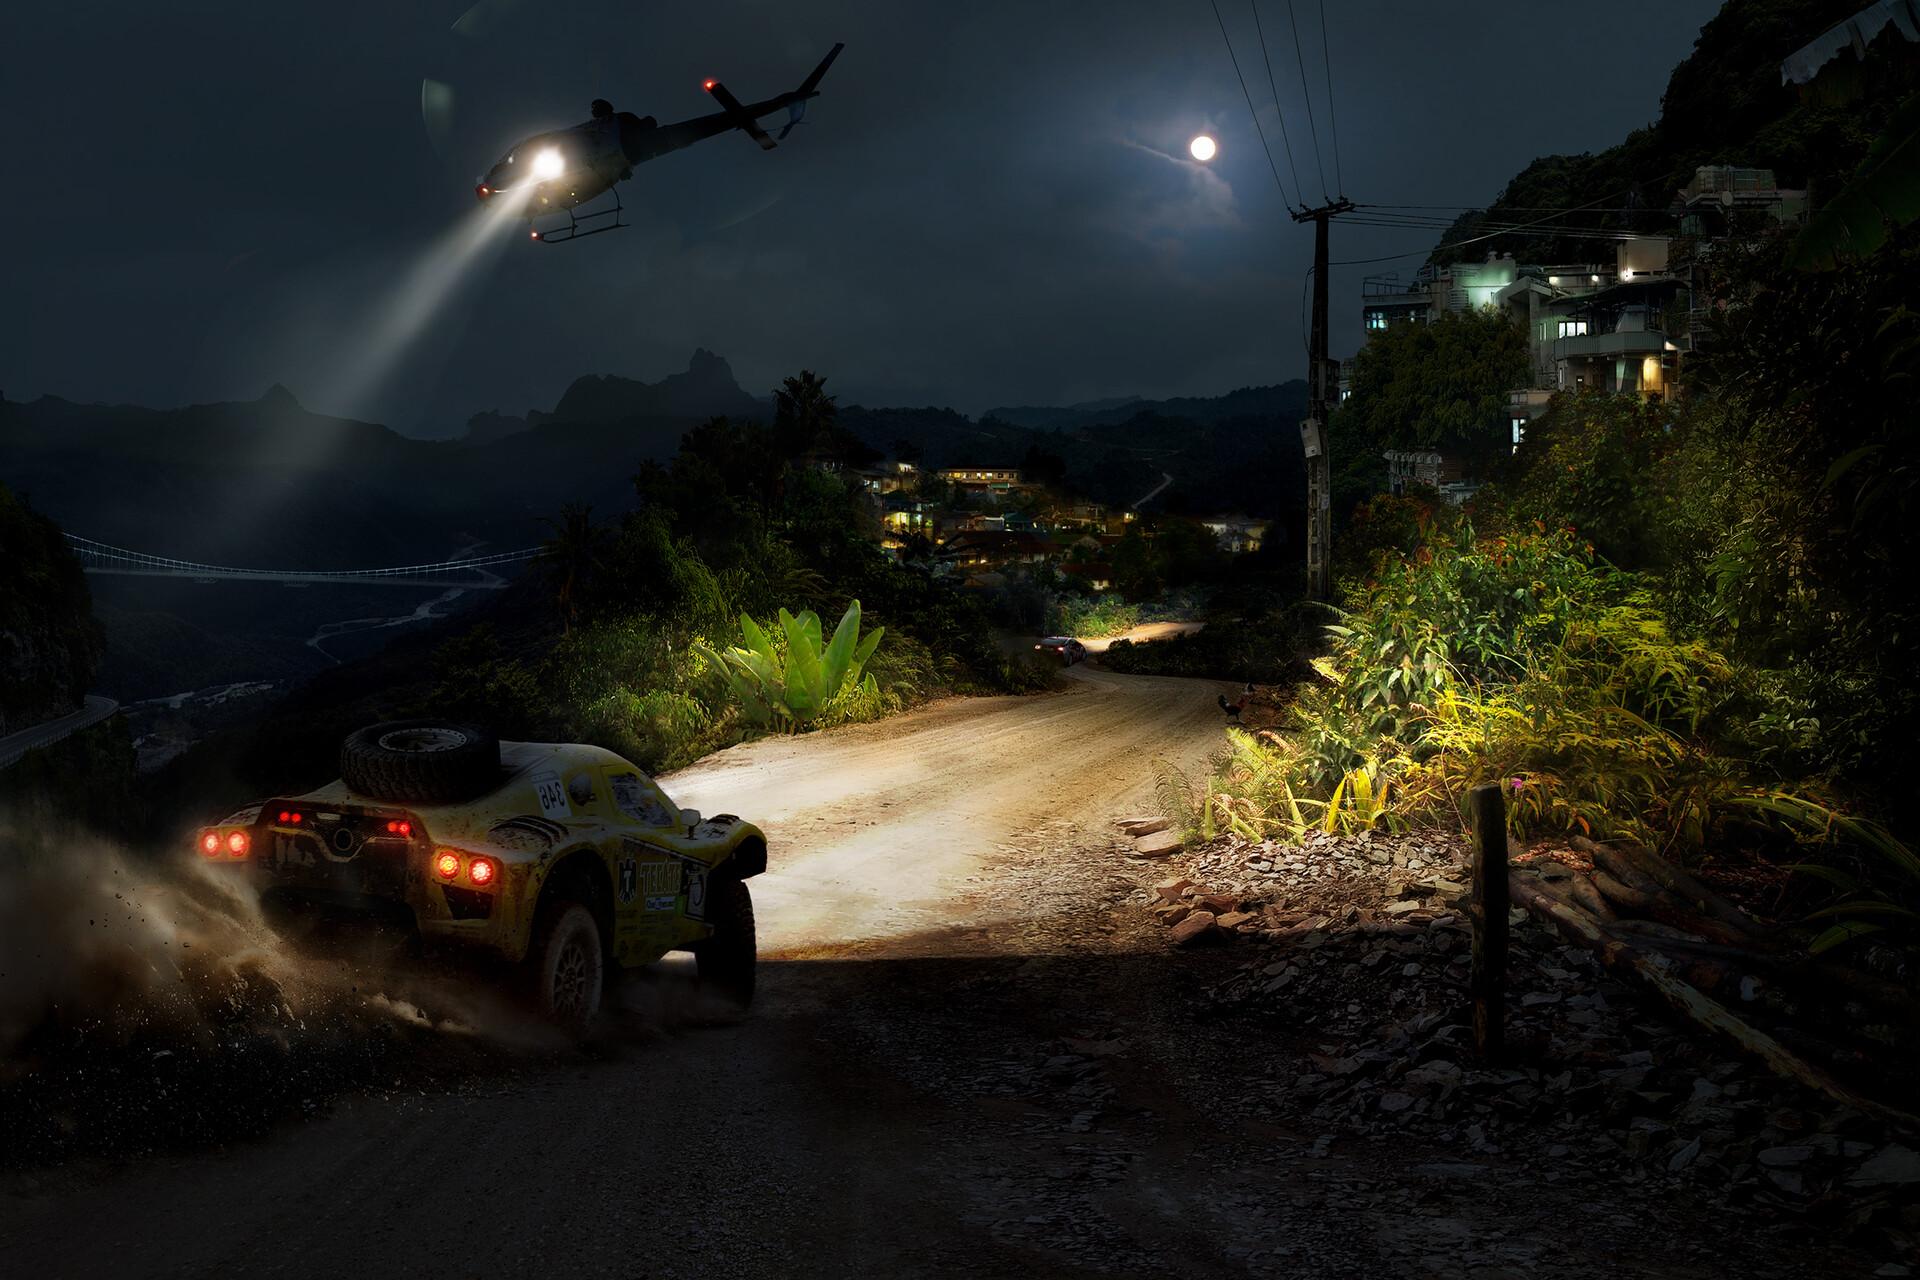 Richard tilbury jungle race nightime